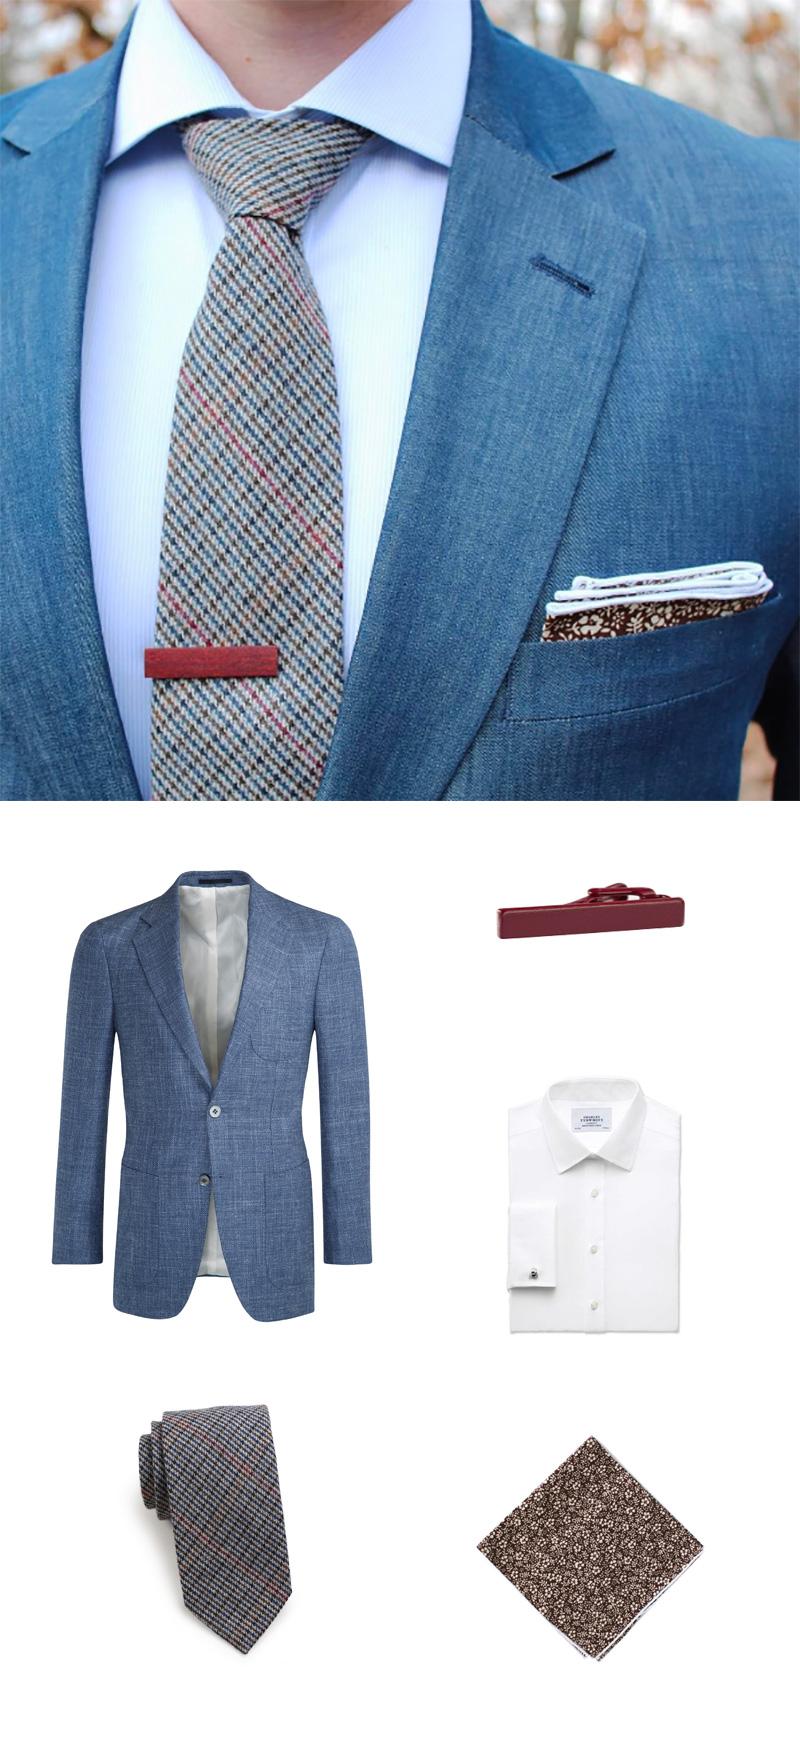 Mens Summer Style - Trendy Blue Jacket + Skinny Check Necktie